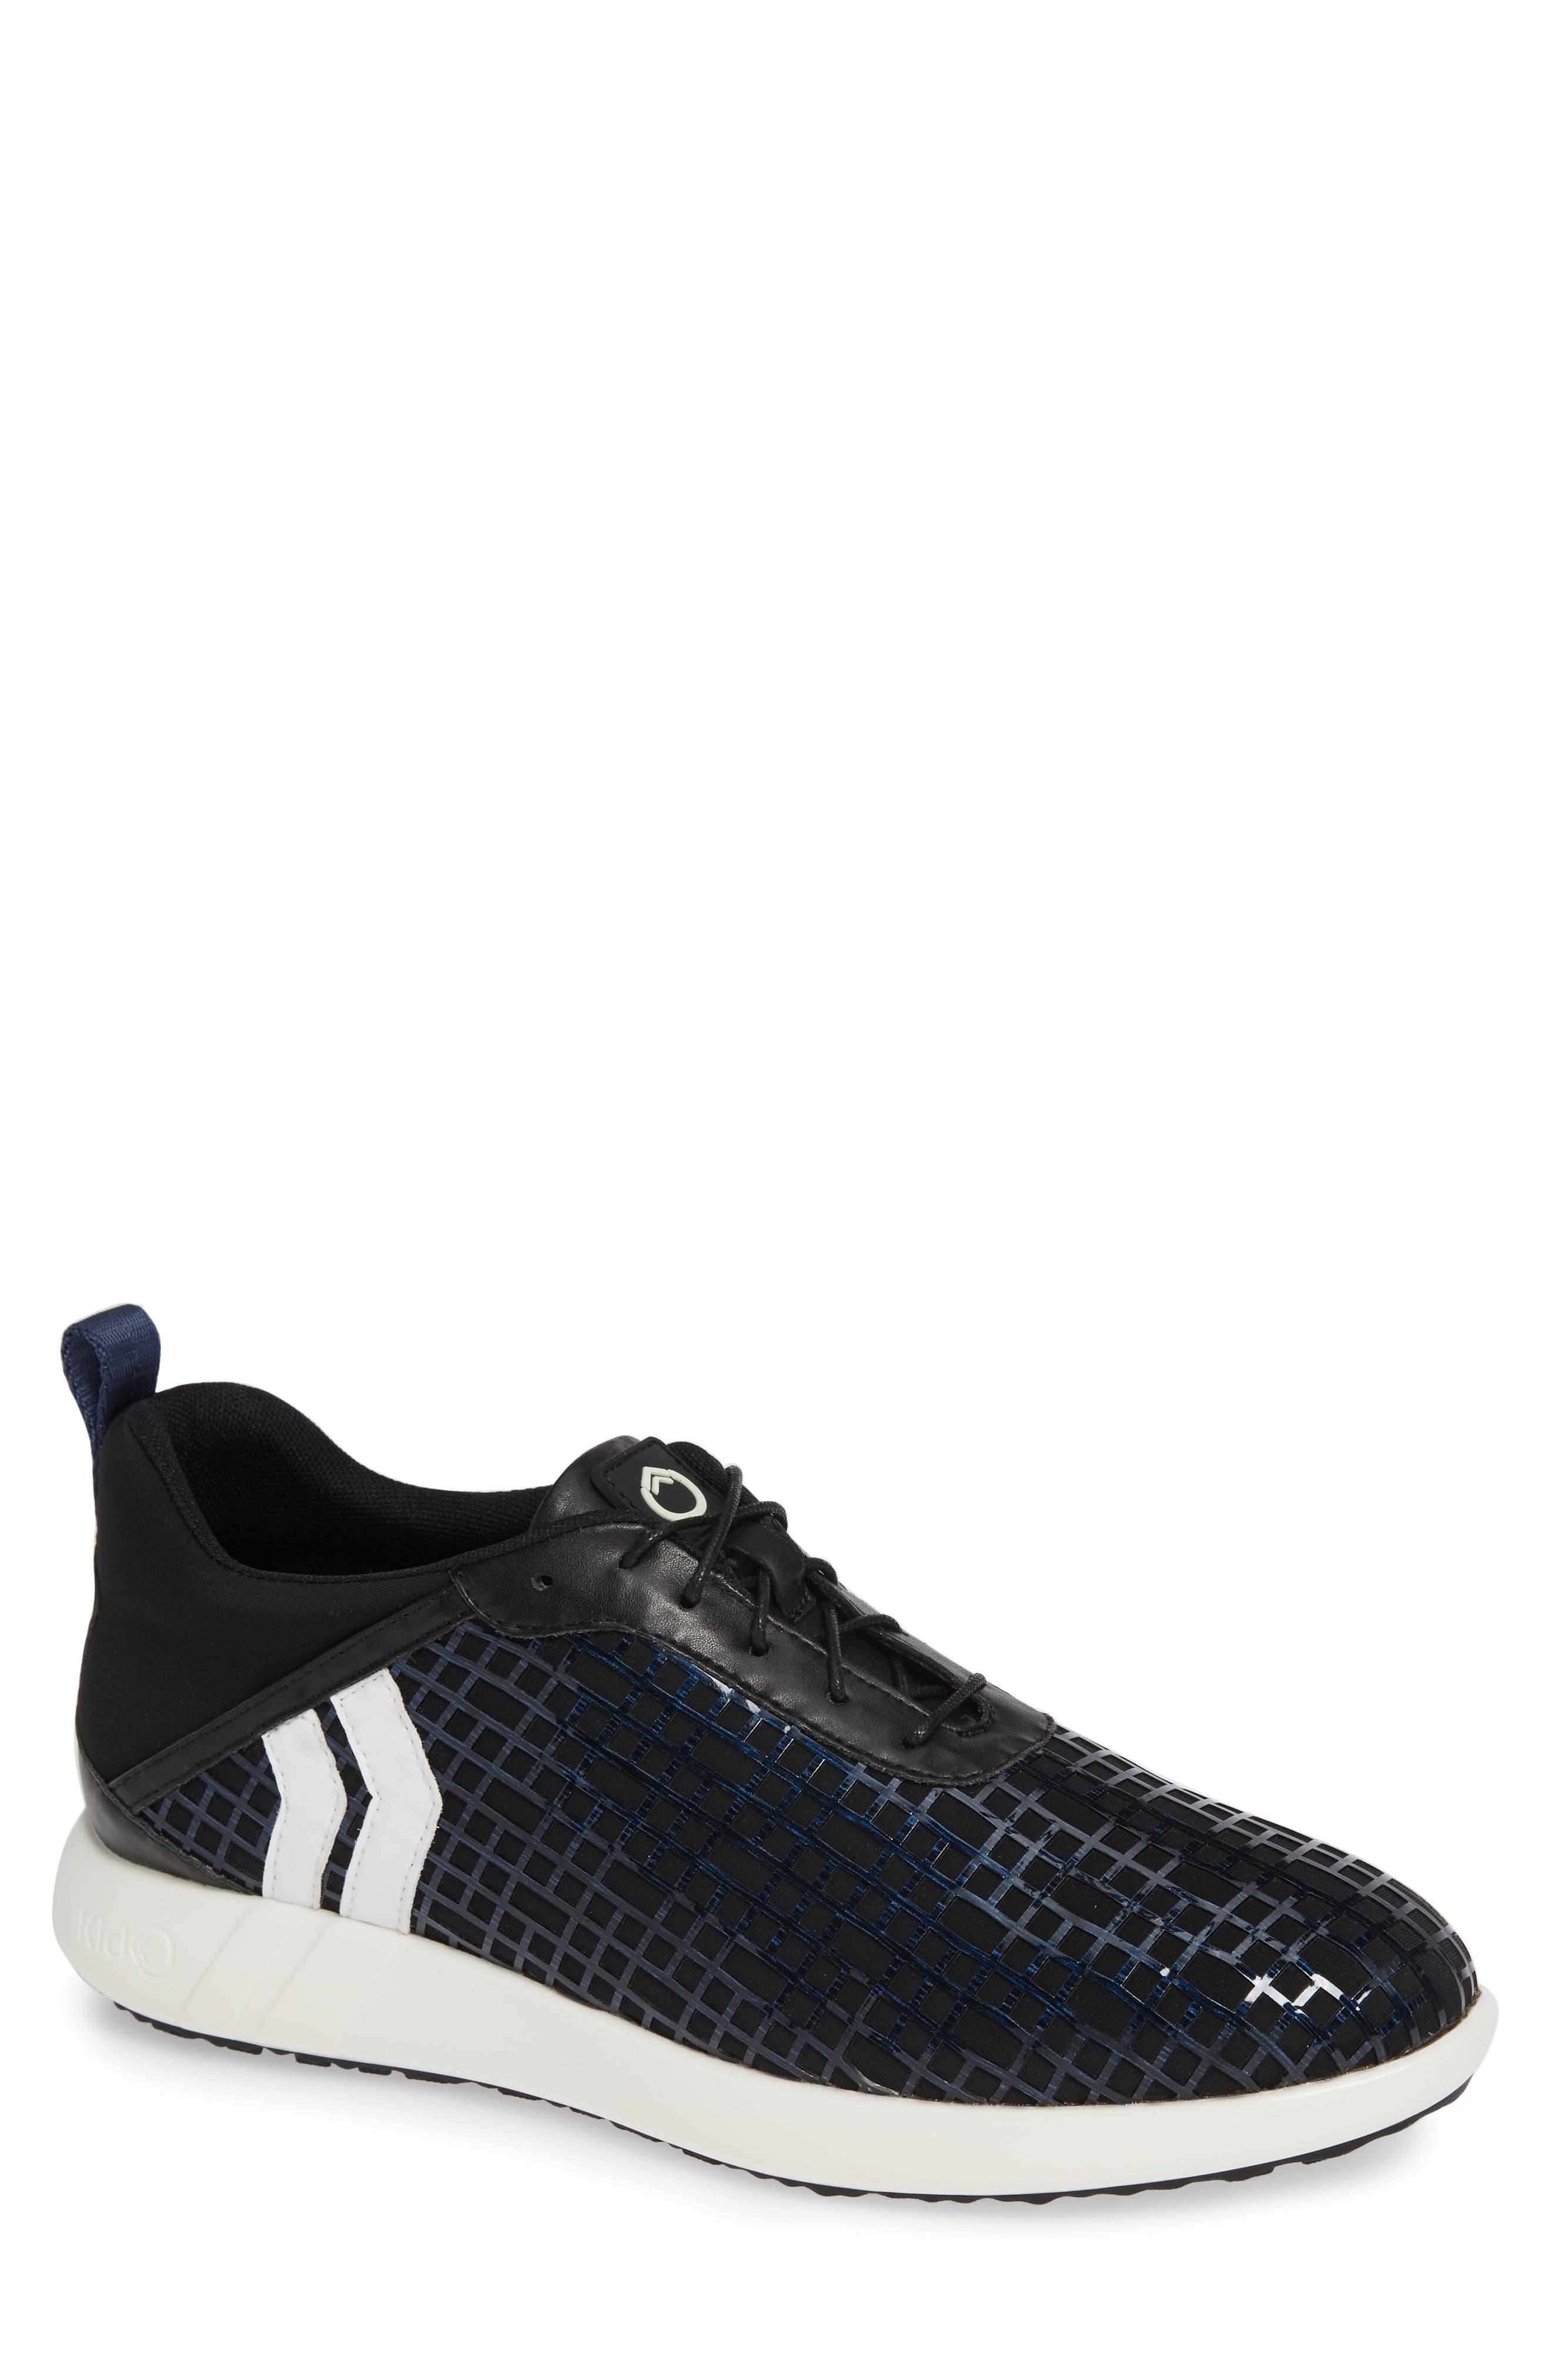 Cielo Sneaker,                             Main thumbnail 1, color,                             410